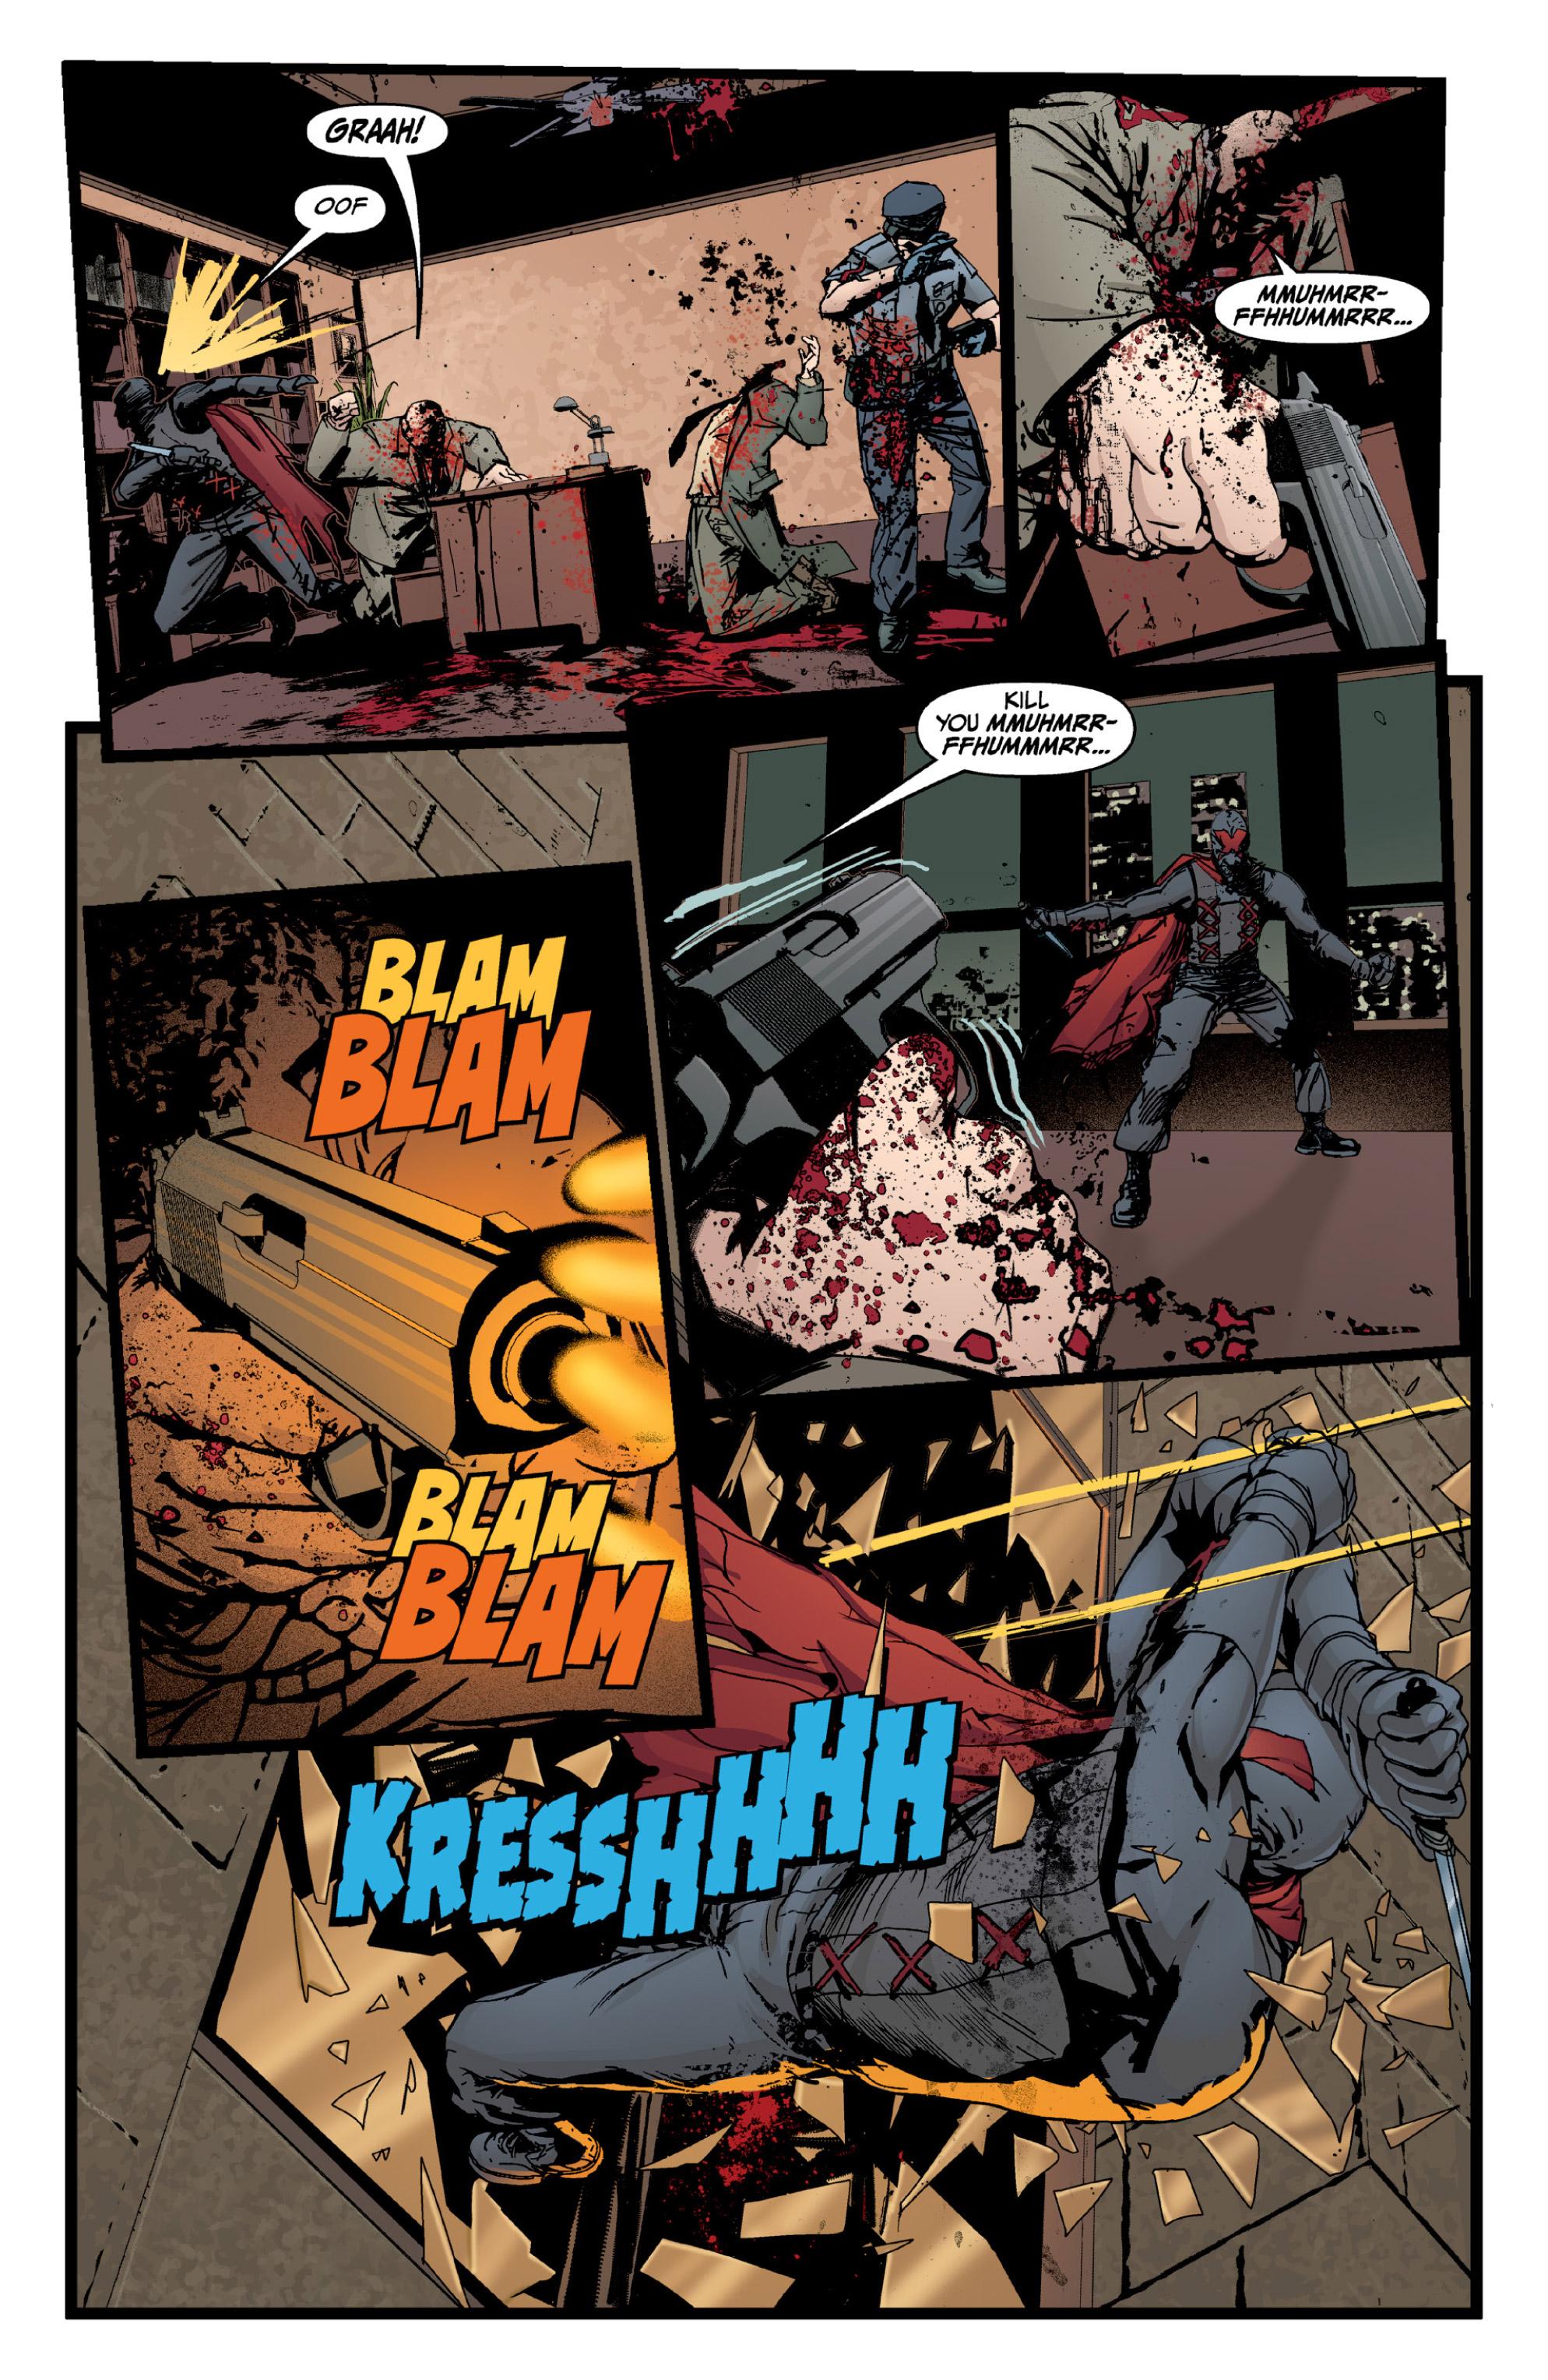 Read online X: Big Bad comic -  Issue # Full - 70